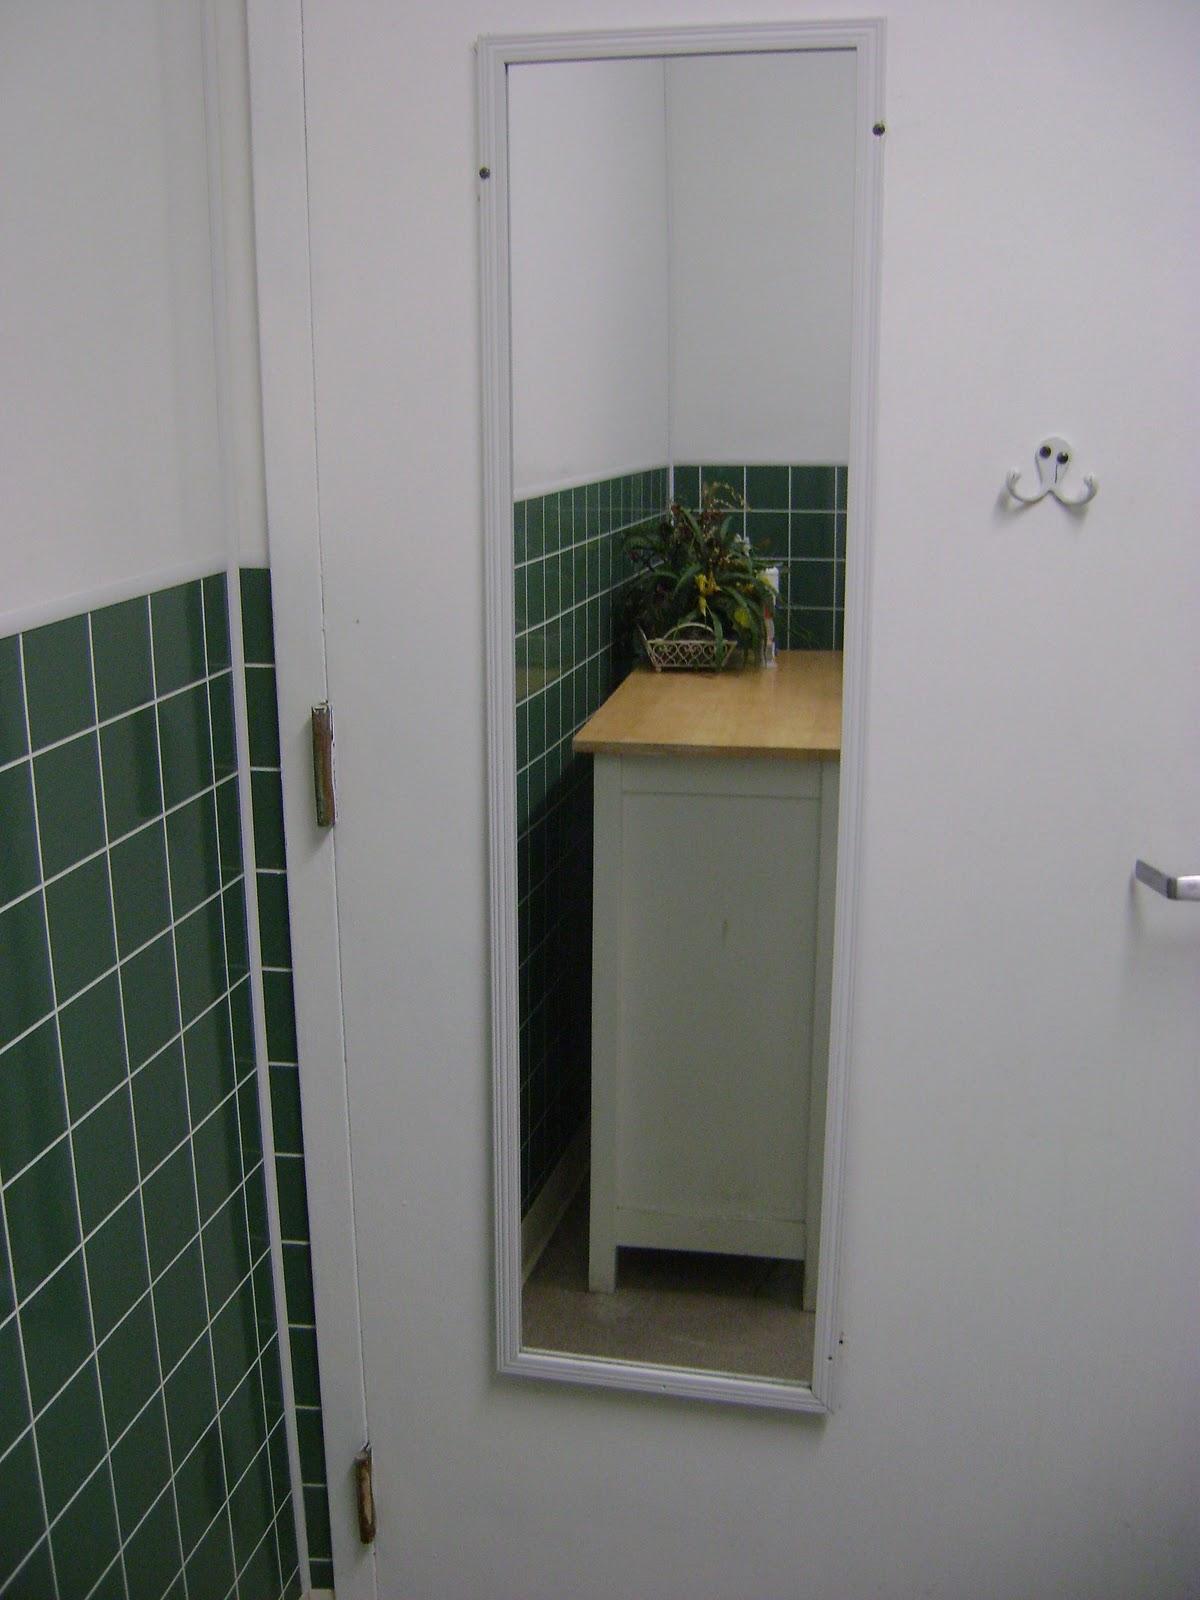 Trader joe 39 s tyngsborough ma non organic bathrooms for Full length bathroom mirror